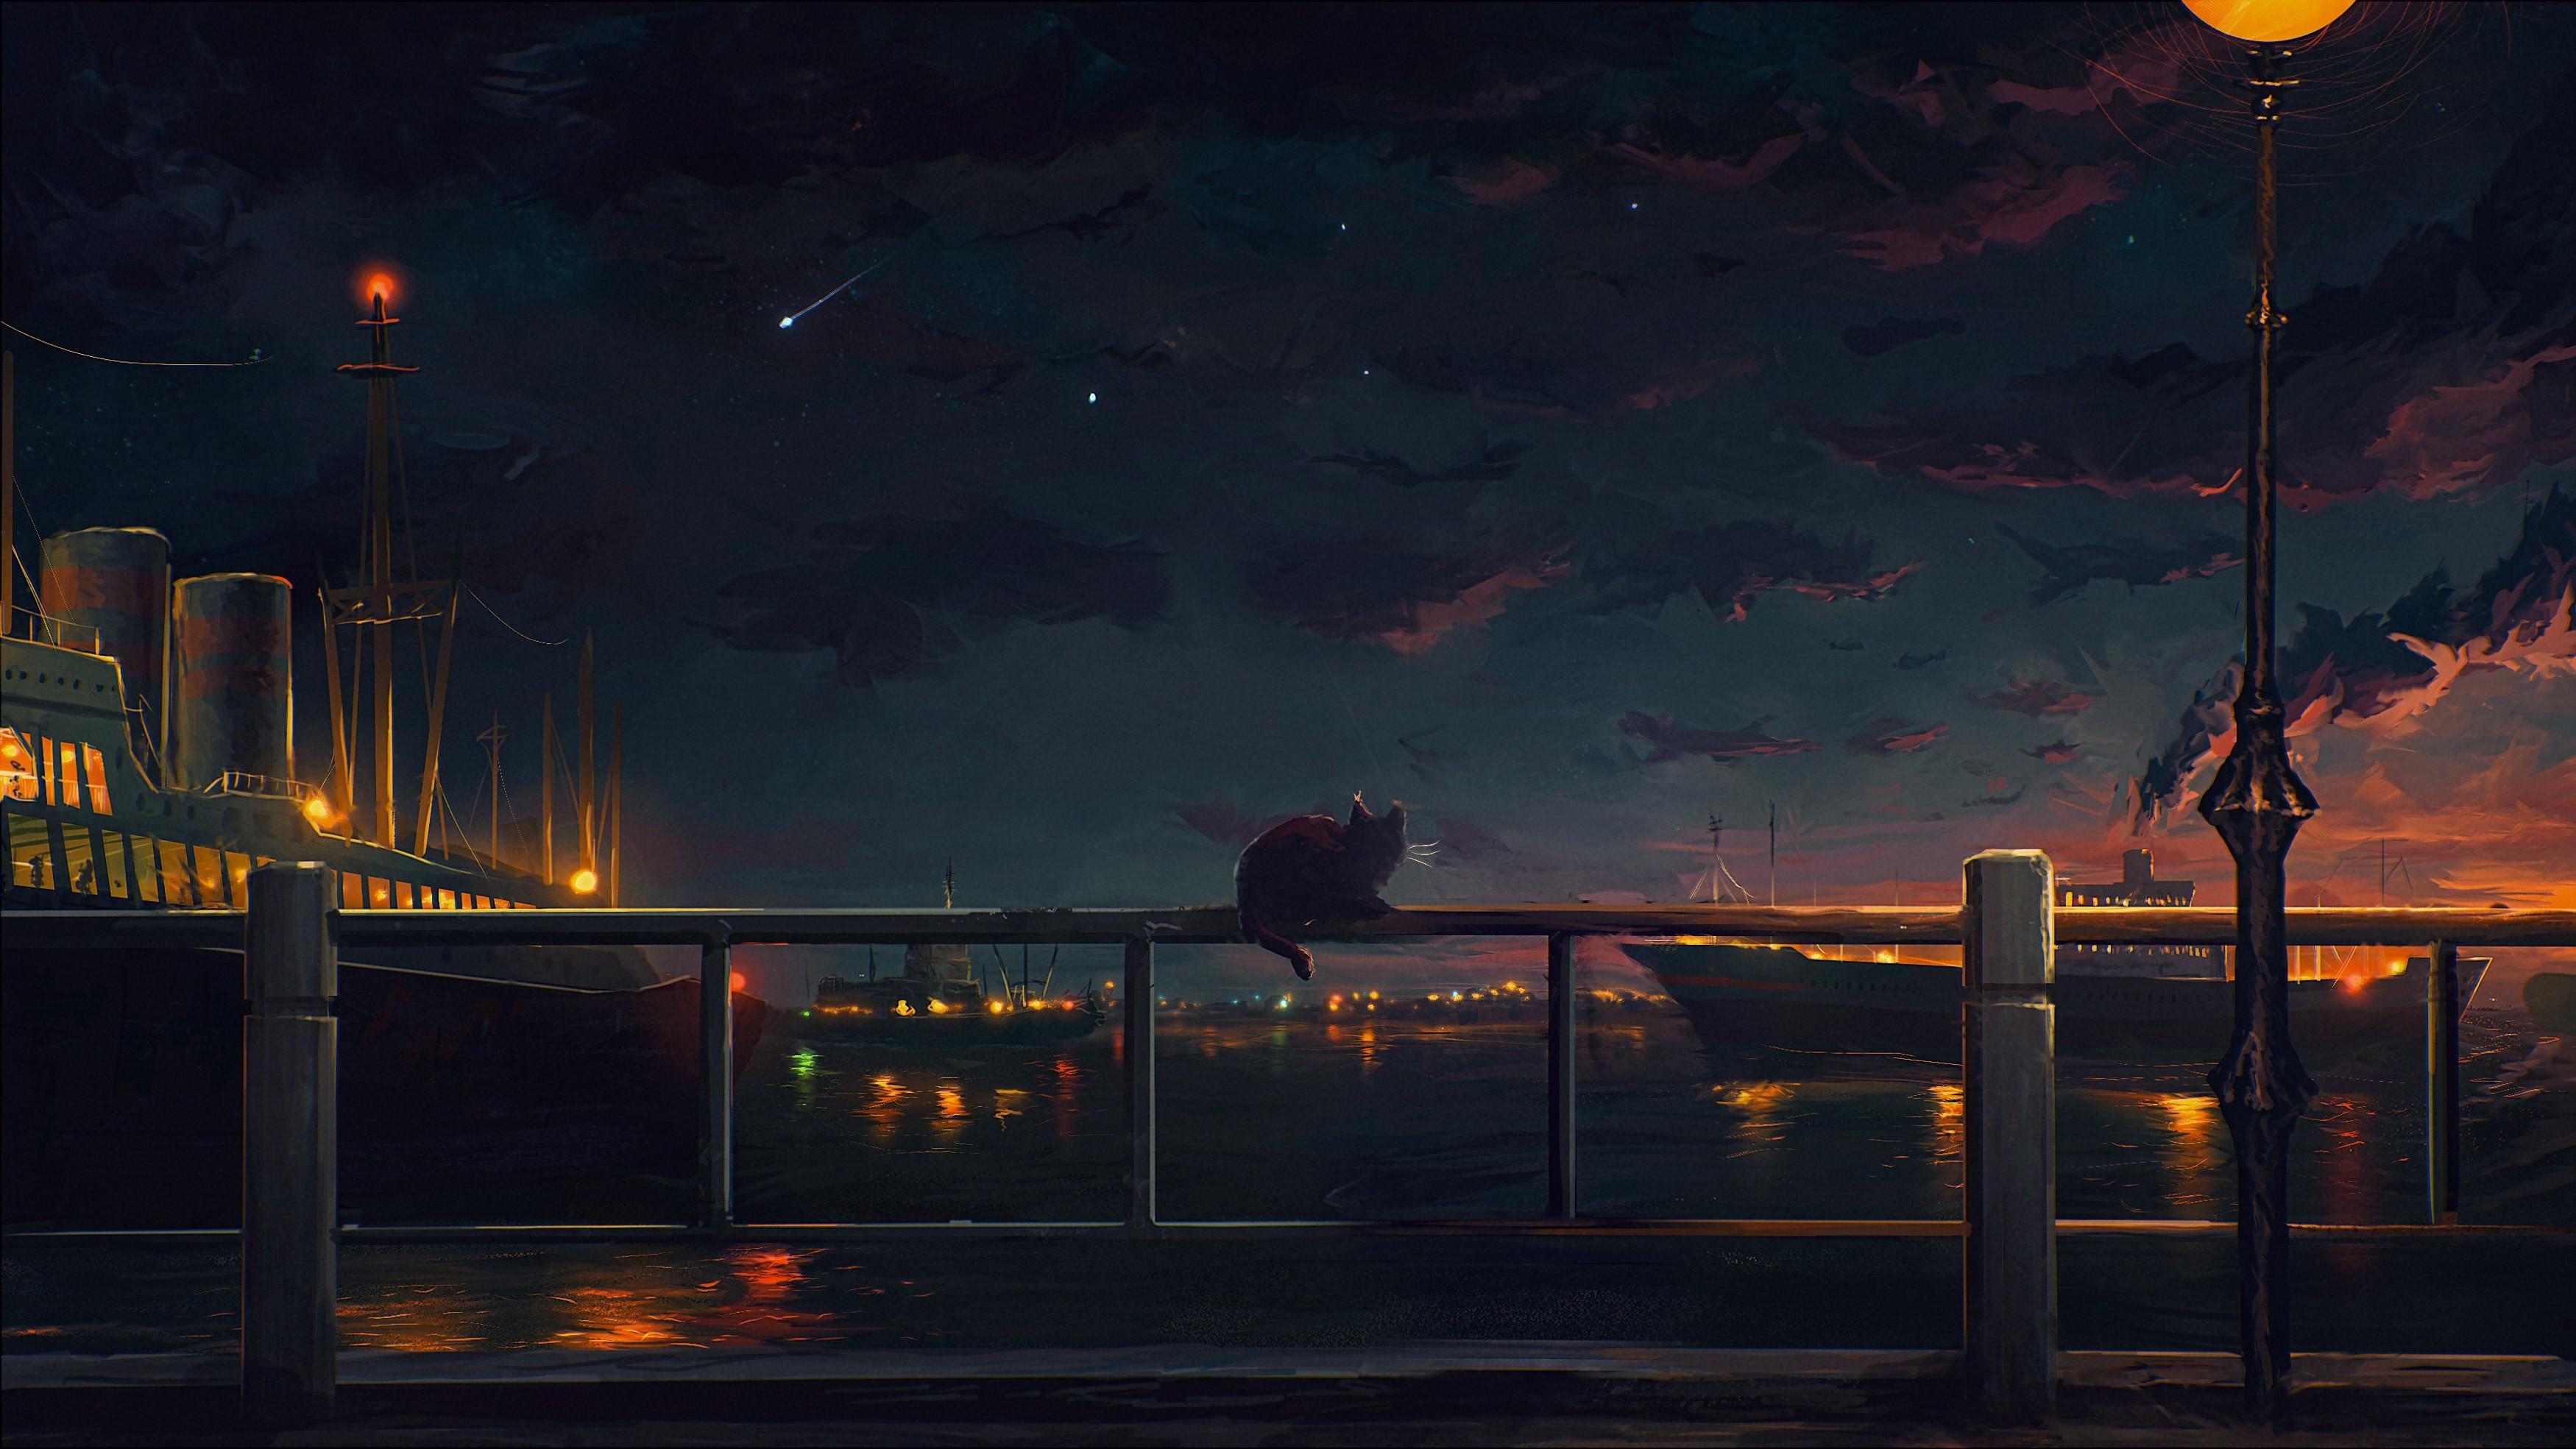 Street Light Ship Cat Sunset Cityscape Night Reflection Stars Evening Dusk Railing Dawn Lighting Darkness